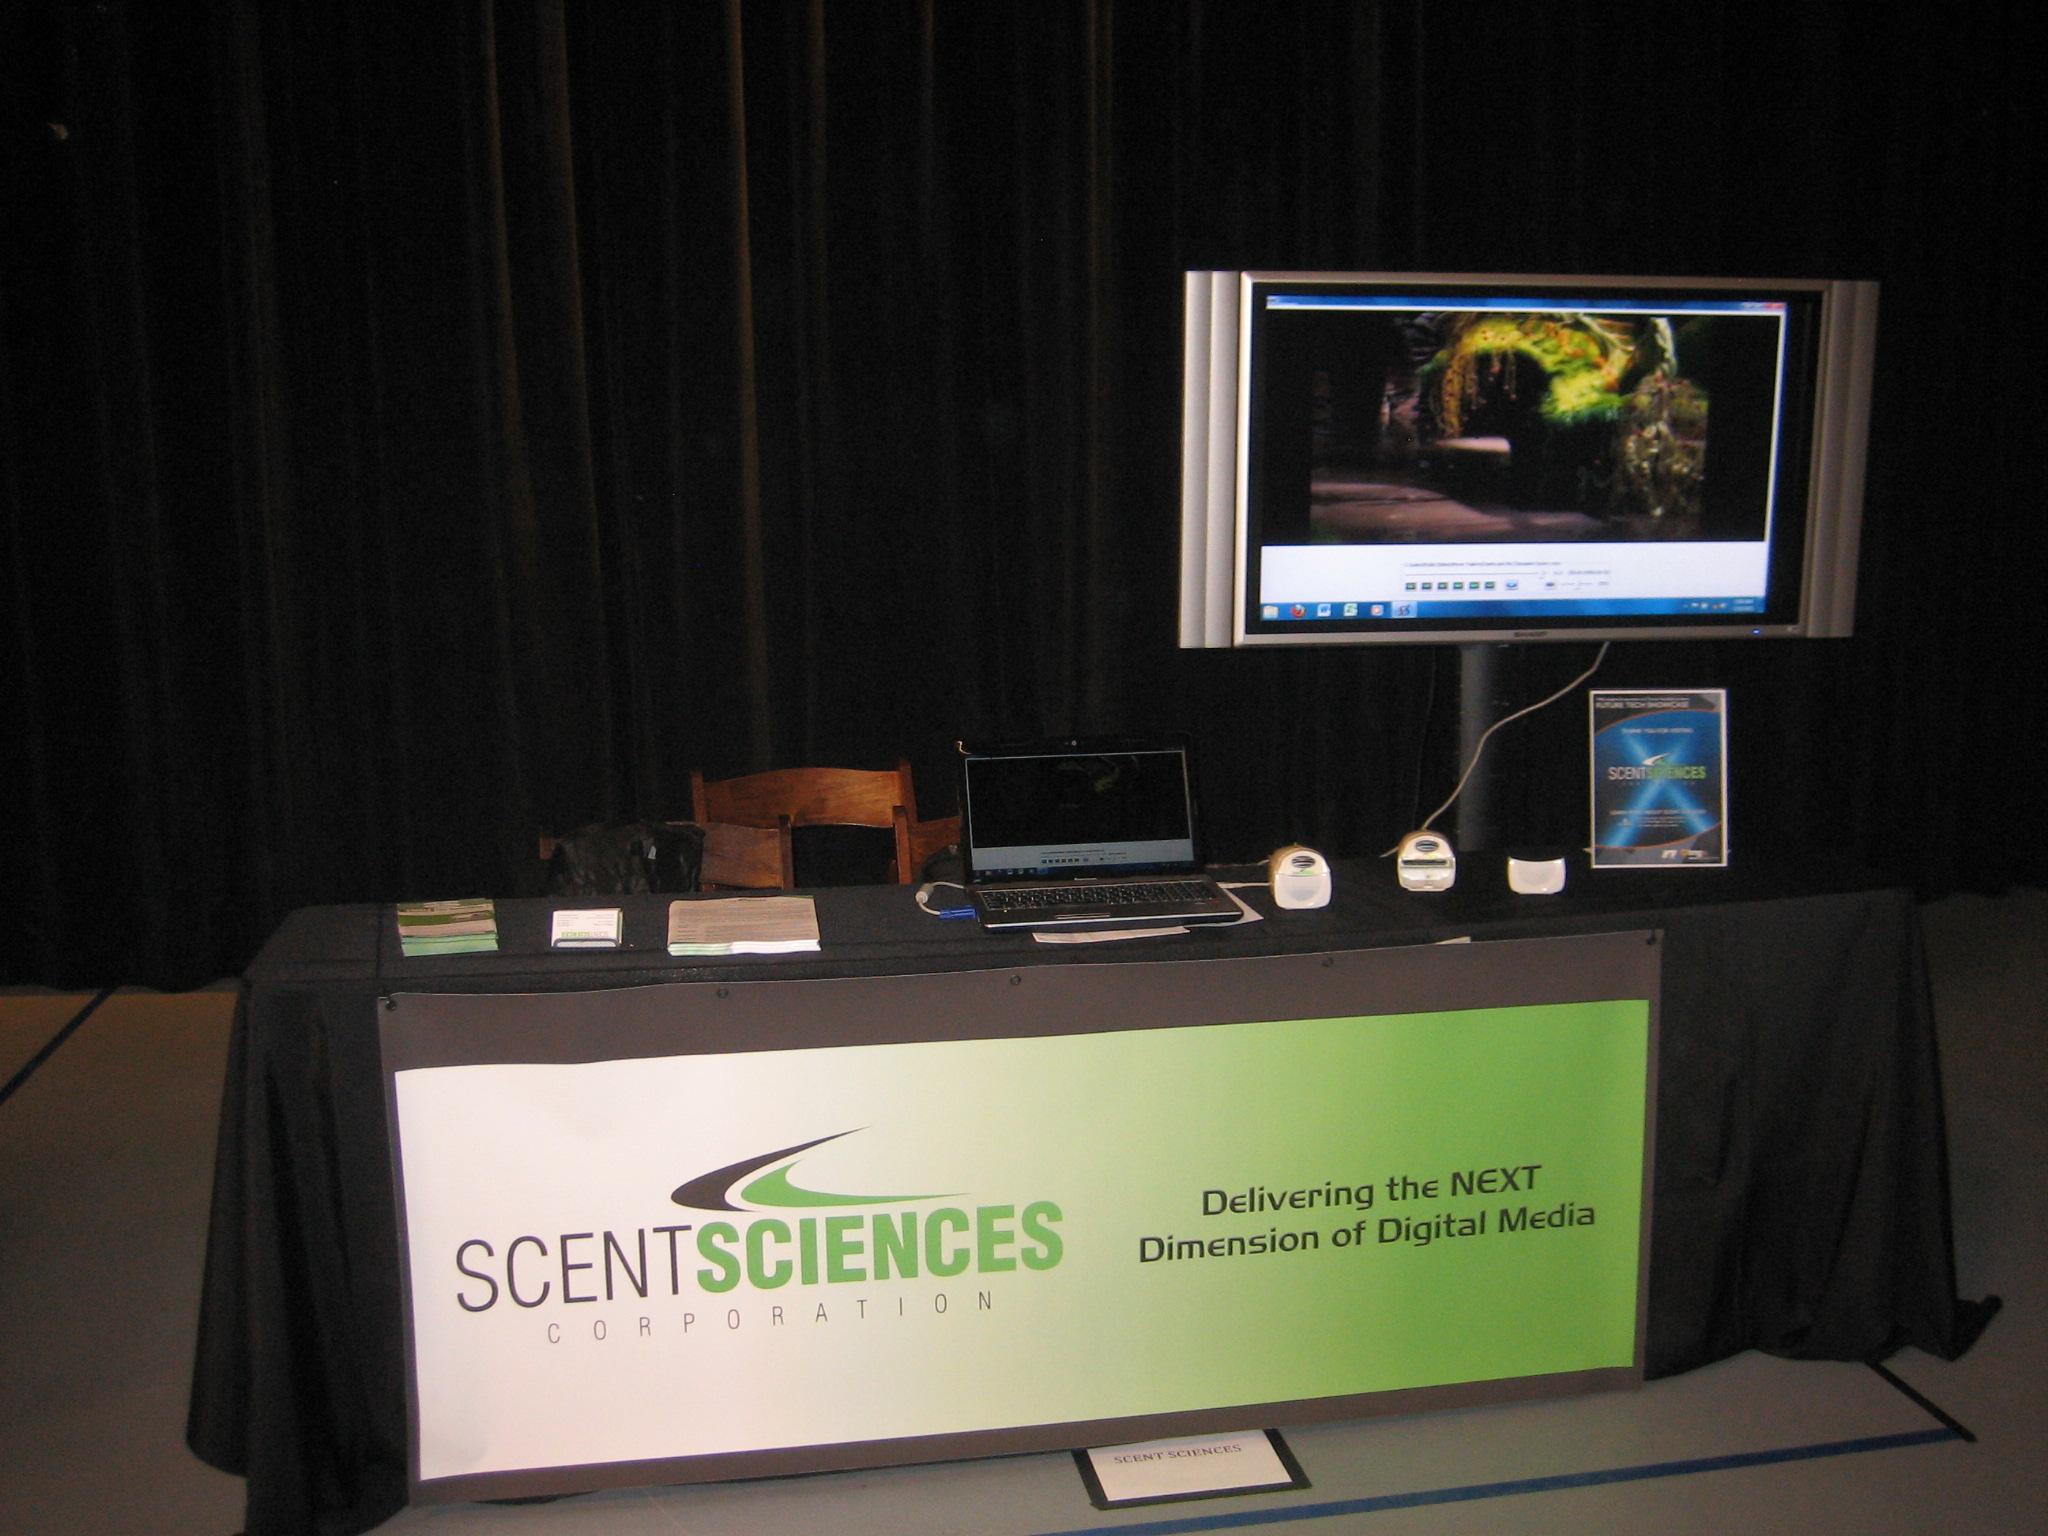 On july 10th scent sciences ceo bill wiles flew into atlanta as